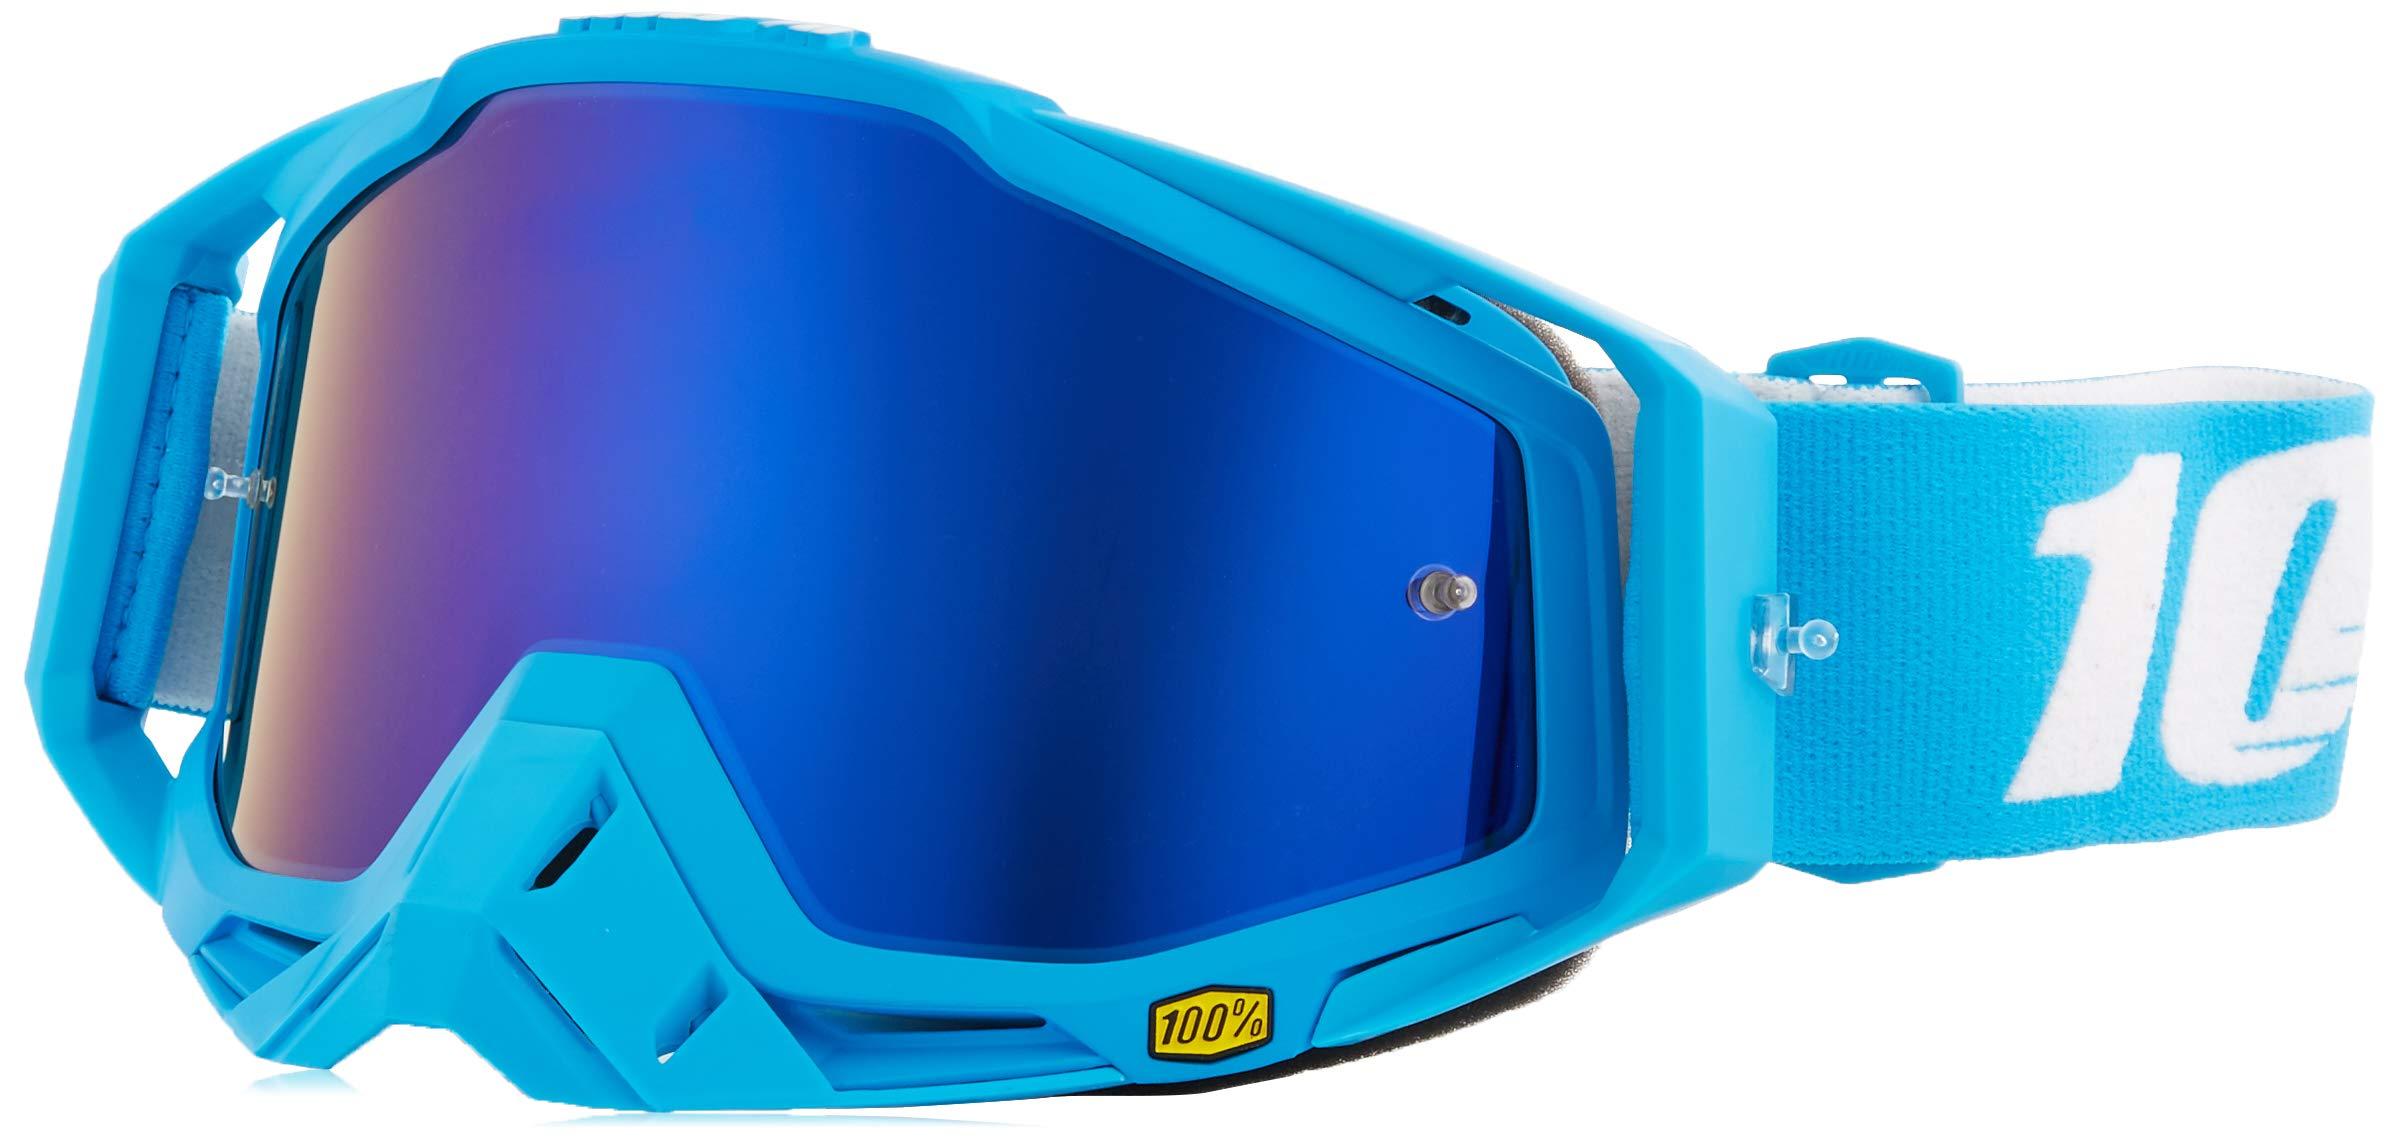 100% Unisex-Adult Speedlab (50110-245-02) RACECRAFT Goggle Monoblock-Mirror Blue Lens, One Size)